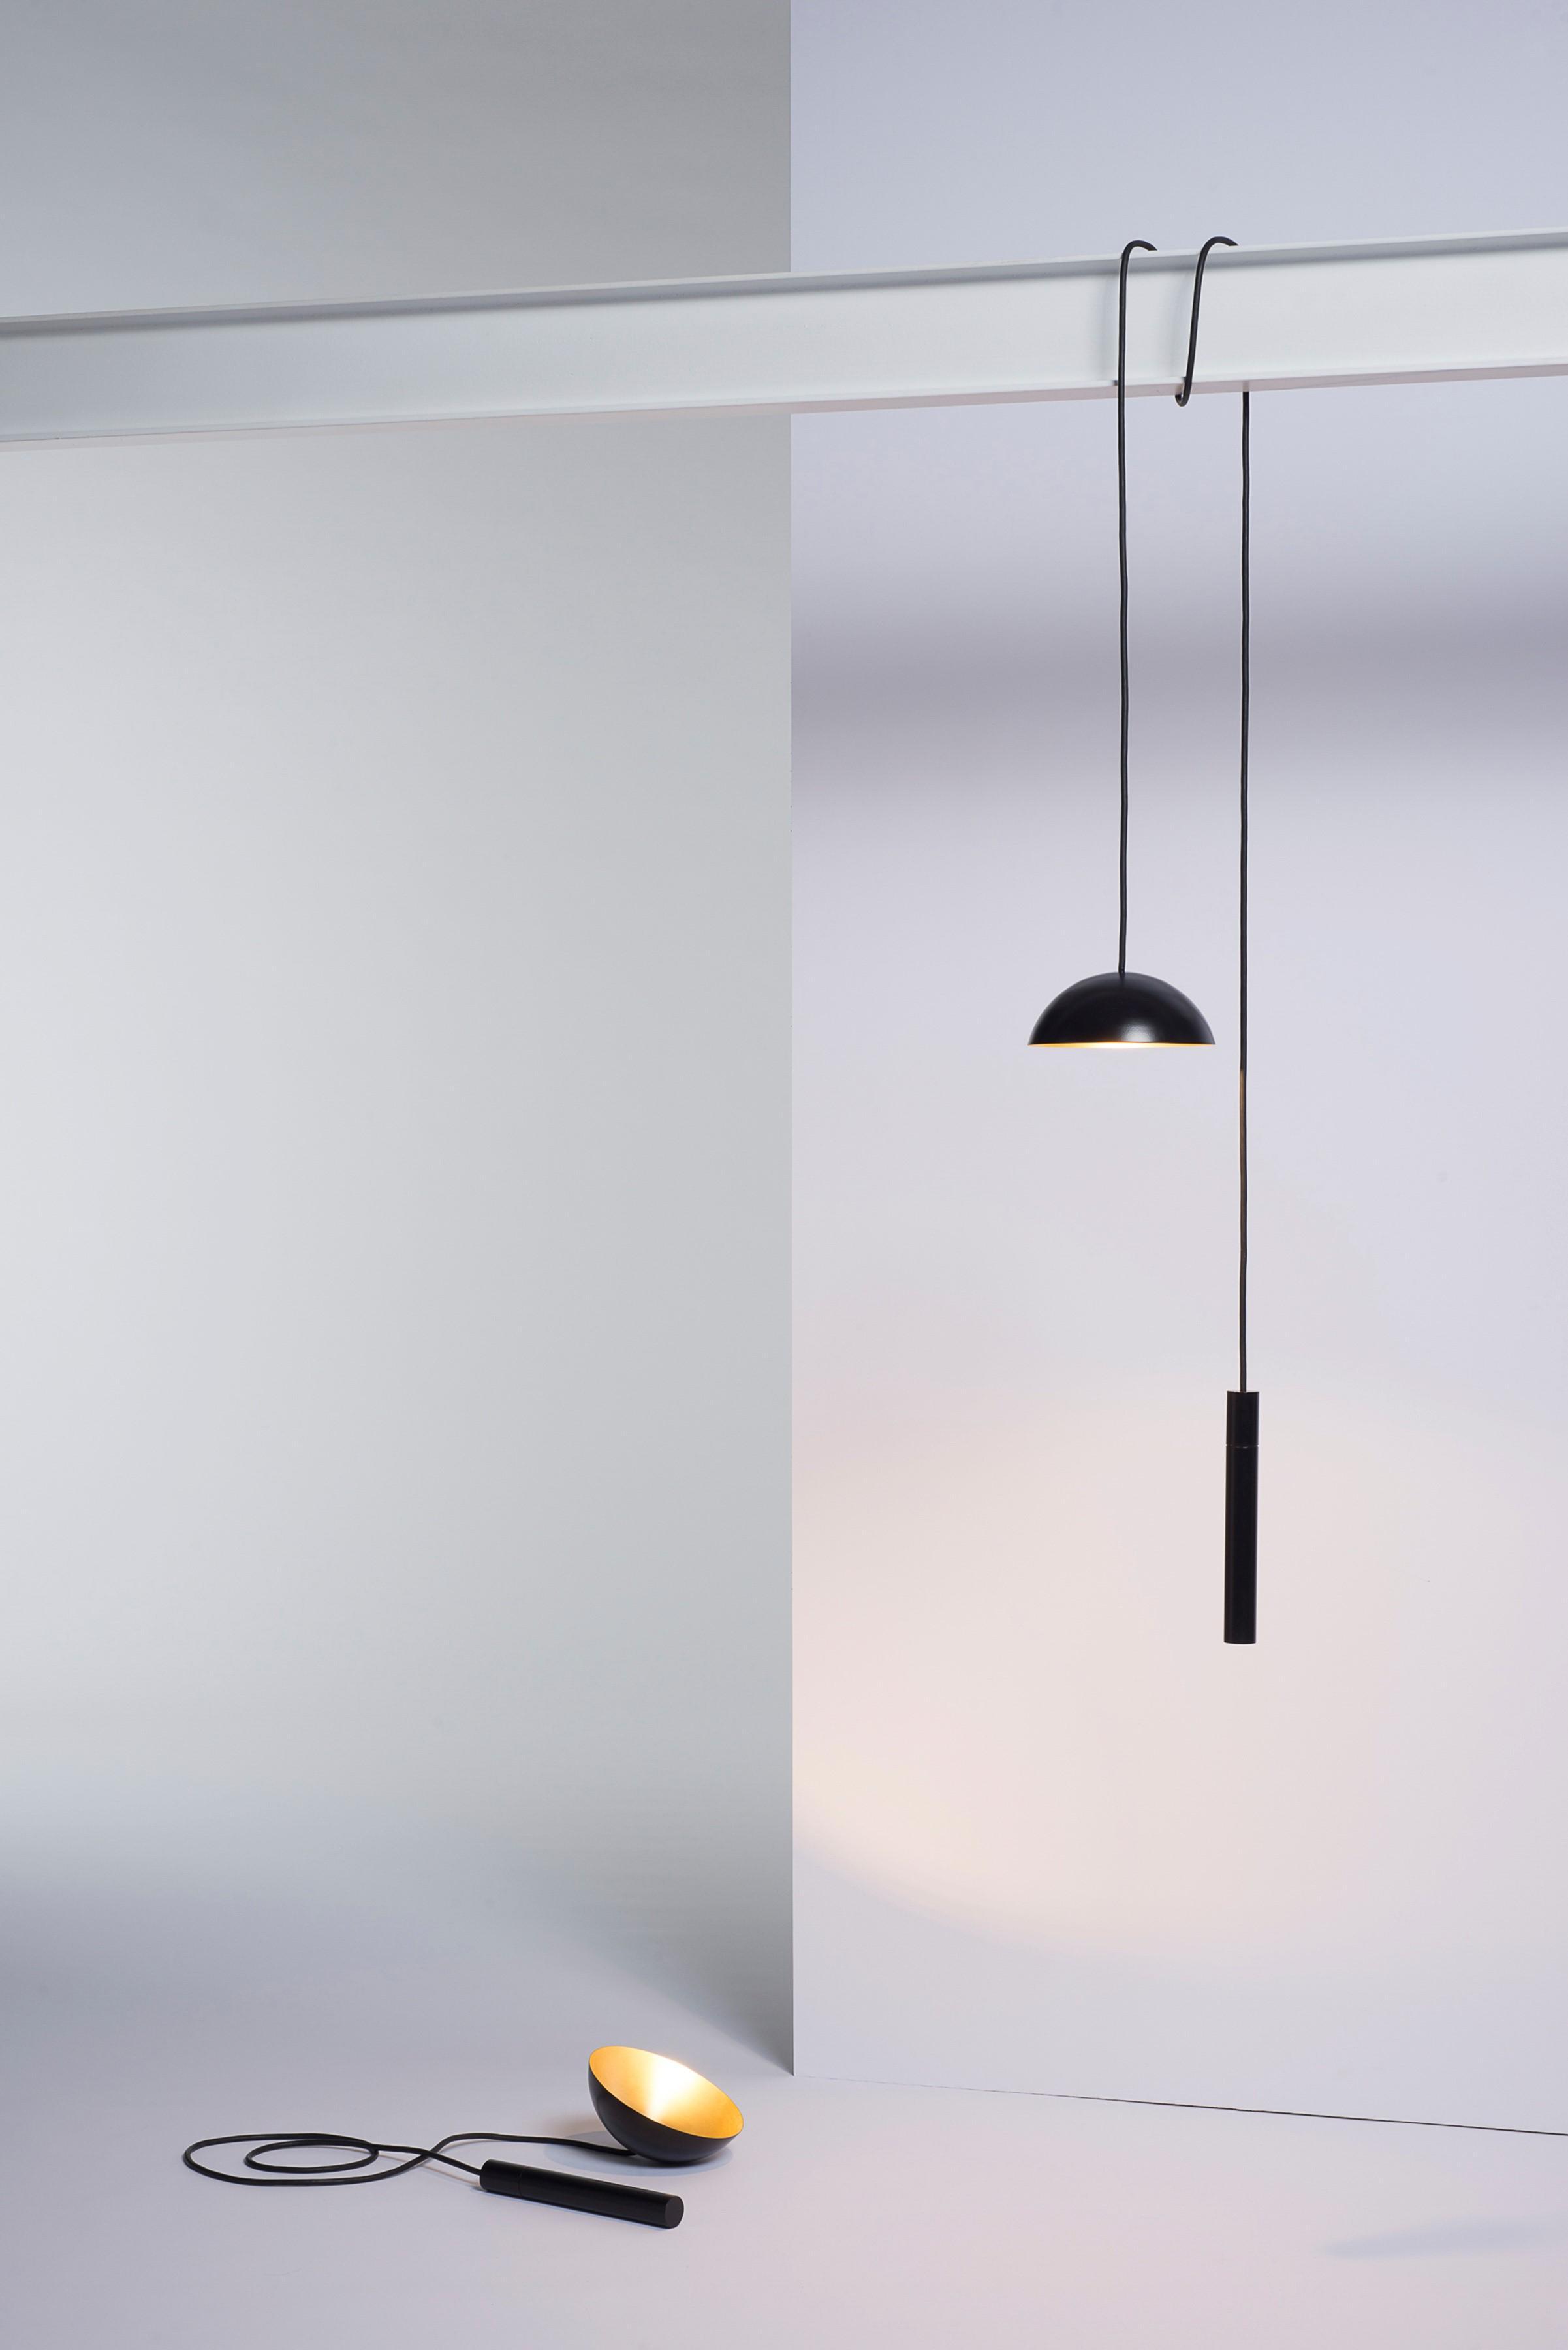 Gewickelt oder gelümmelt, indoor/ outdoor - DESIGNBOTE